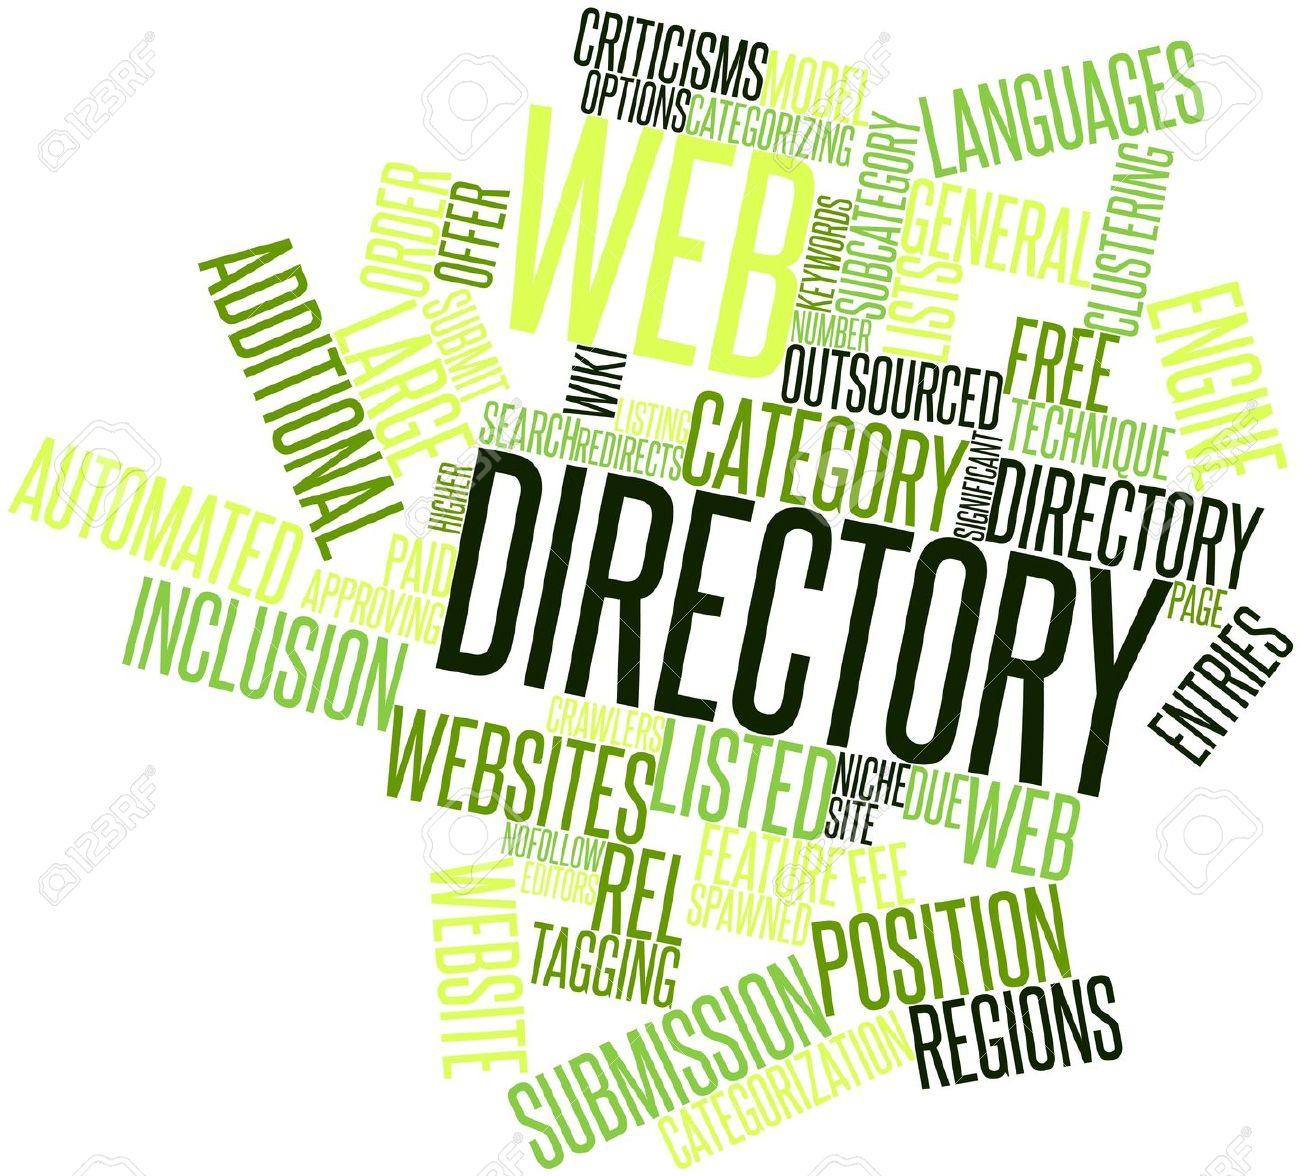 websitedirectory